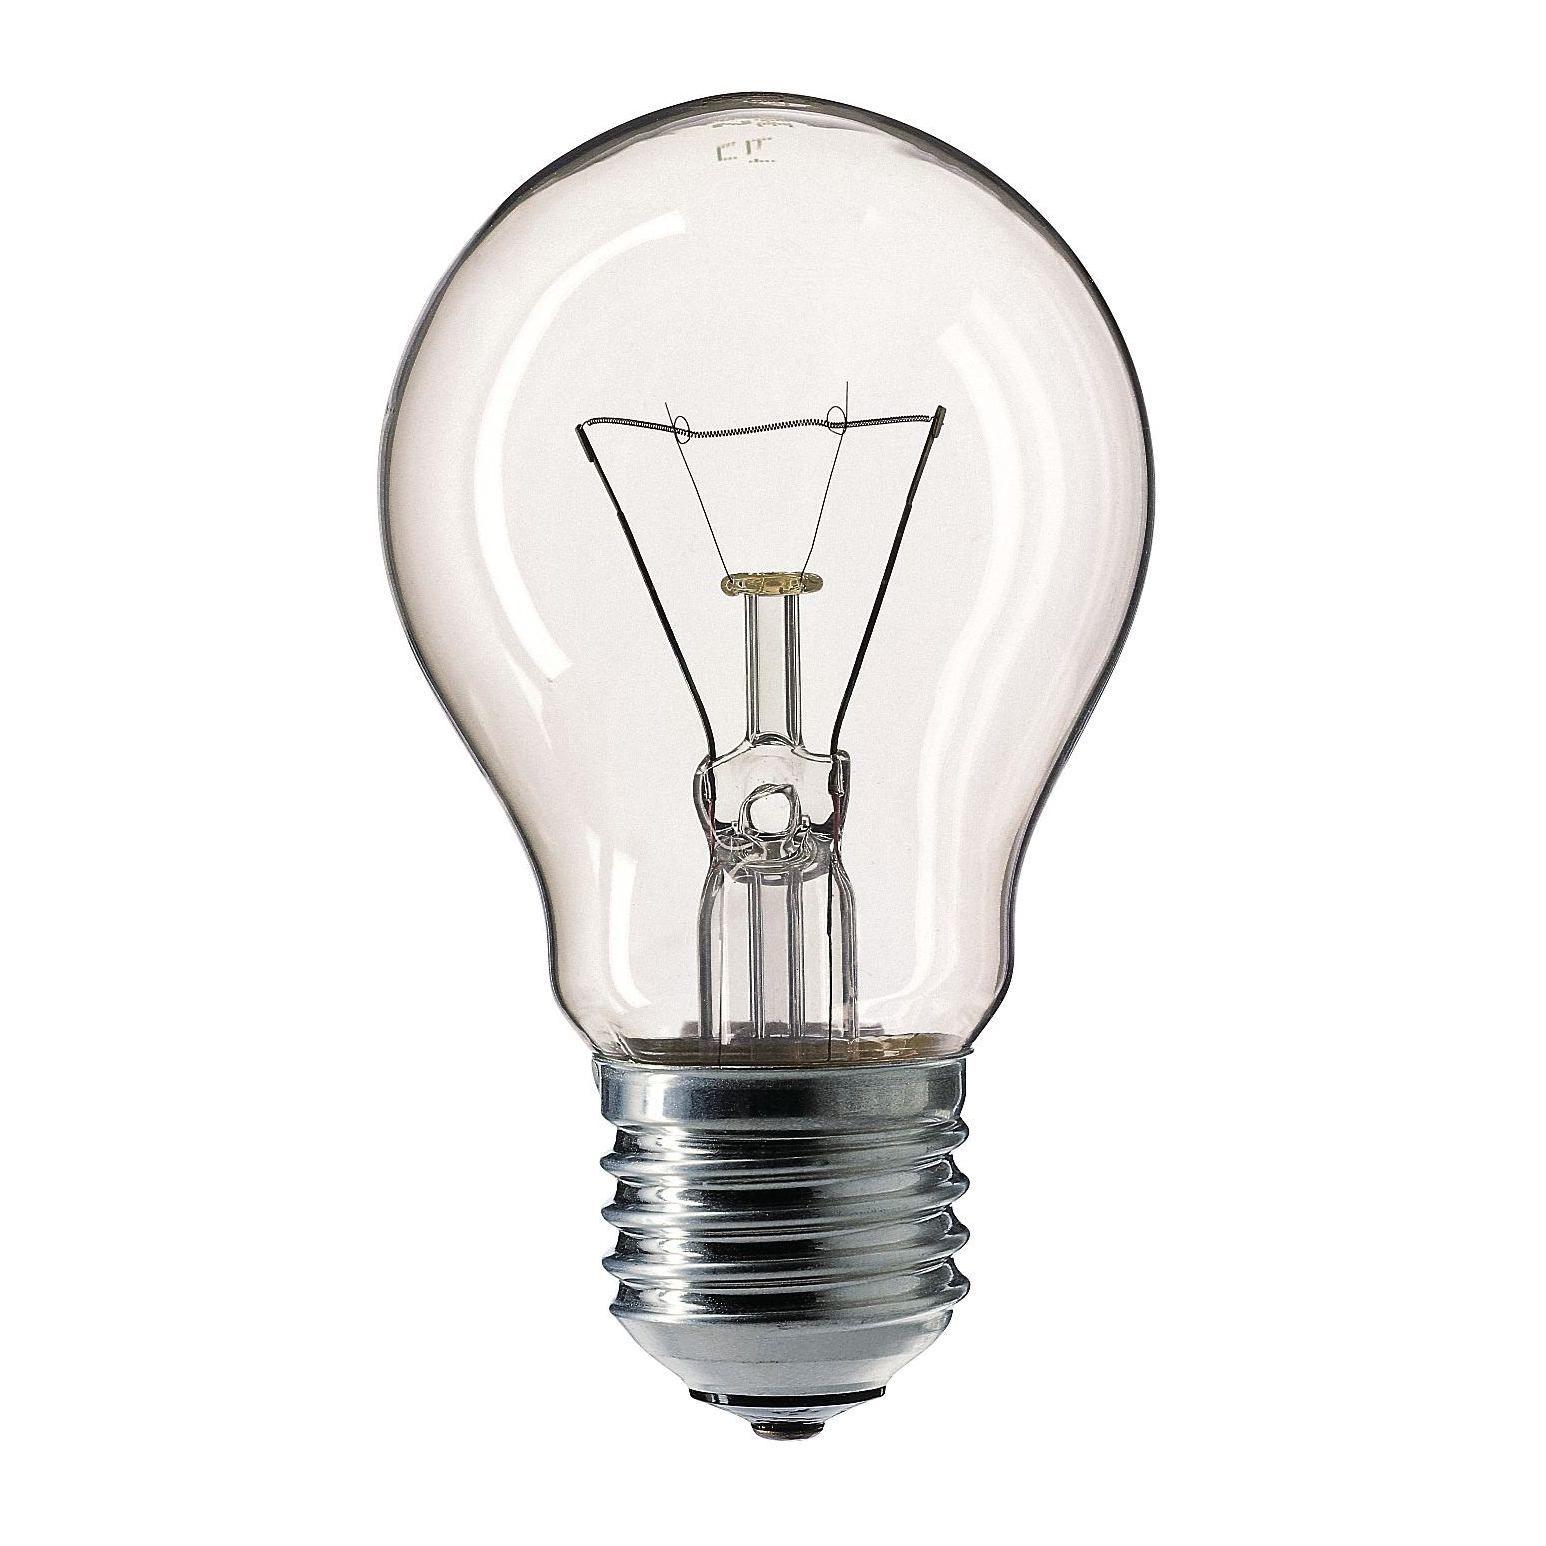 Купить Лампа накаливания Philips Stan 40W E27 230V A55 CL 1CT/12X10F прозрачная